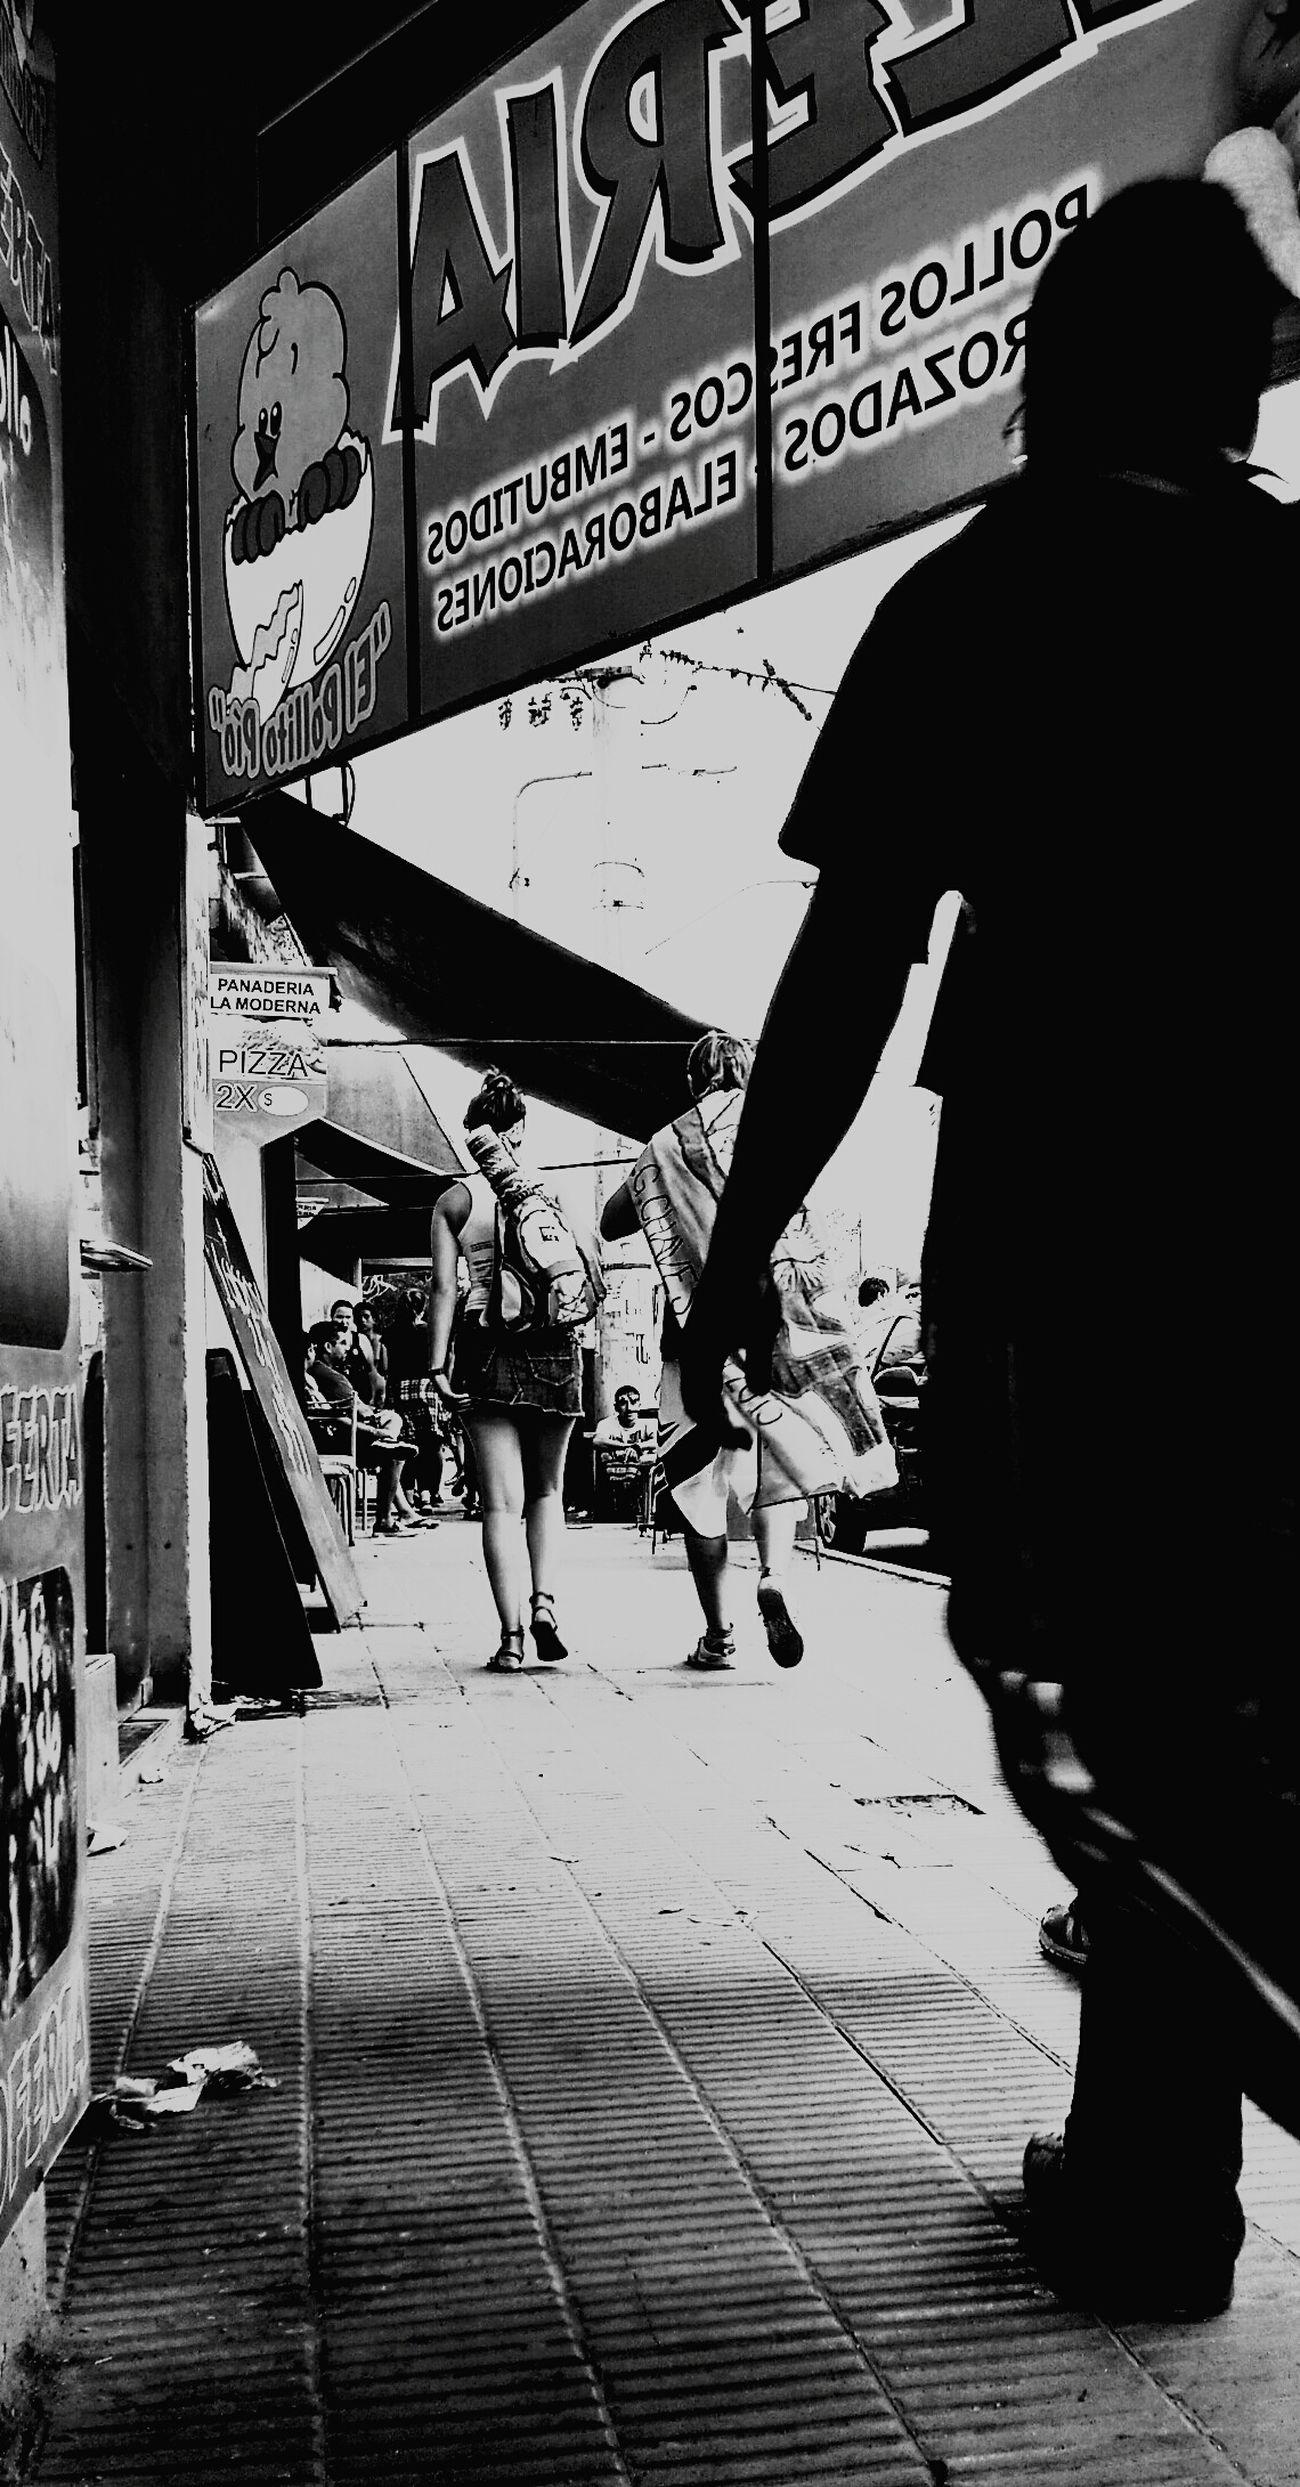 Hello World Taking Photos Córdoba Cosquínrock Love Argentina Photography Argentina Pareja Callejeros Donosvaldo Disparo Silencioso Blackandwhite Blanco & Negro  Blancoynegro Gente Fotografa Fotografie Fotography Fotografia